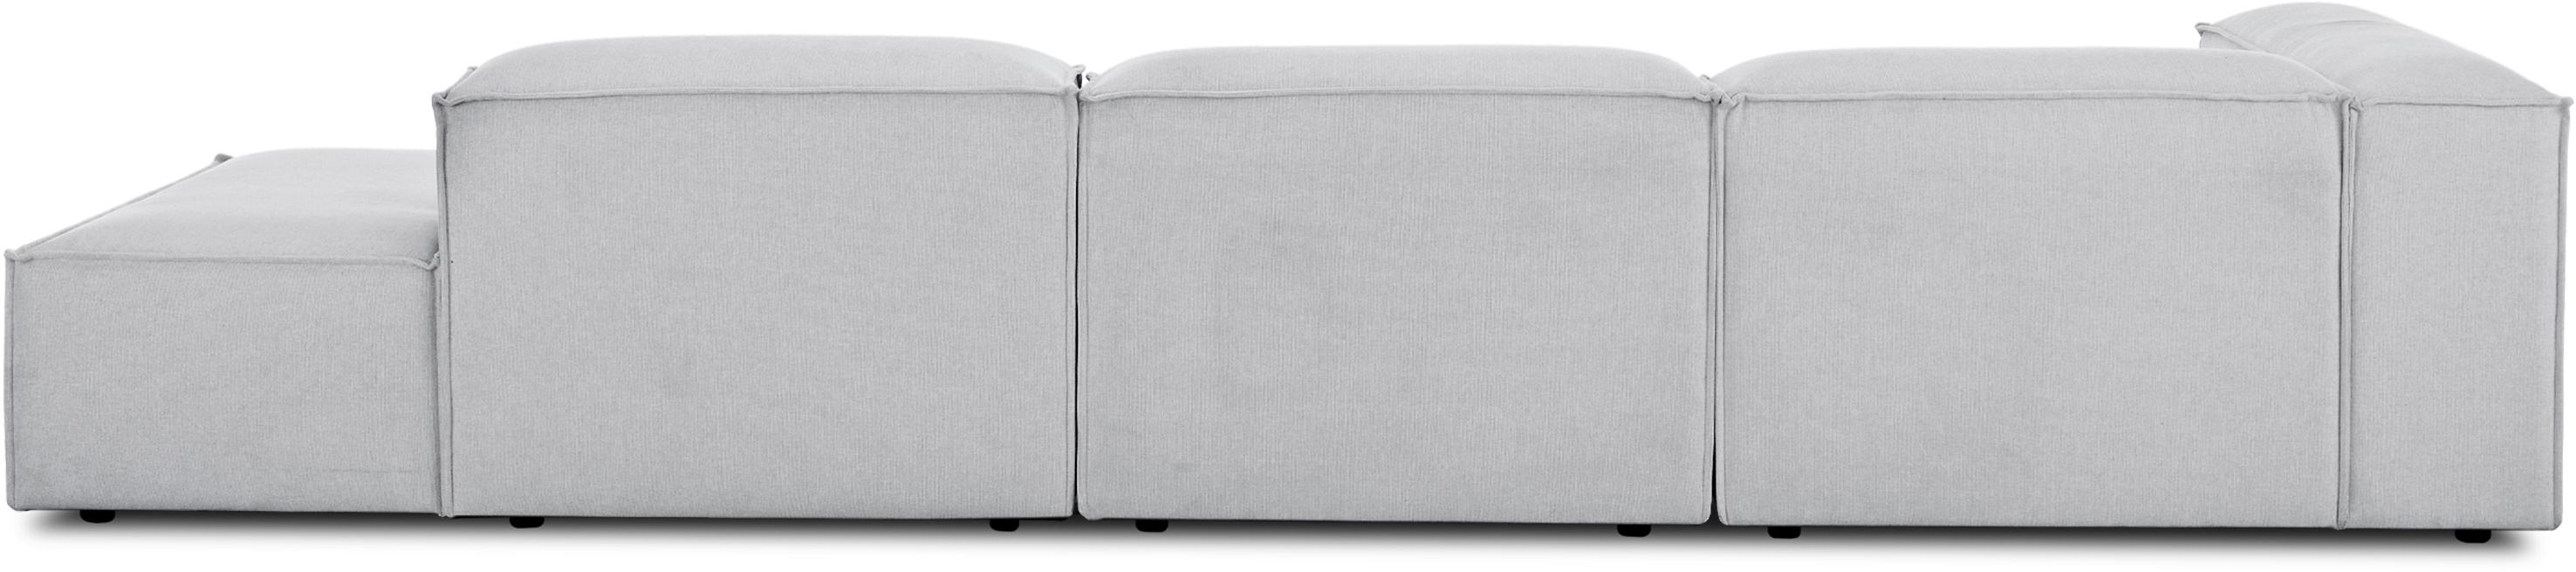 Modulare XL-Ottomane Lennon, Bezug: Polyester 35.000 Scheuert, Gestell: Massives Kiefernholz, Spe, Füße: Kunststoff, Webstoff Hellgrau, B 357 x T 119 cm